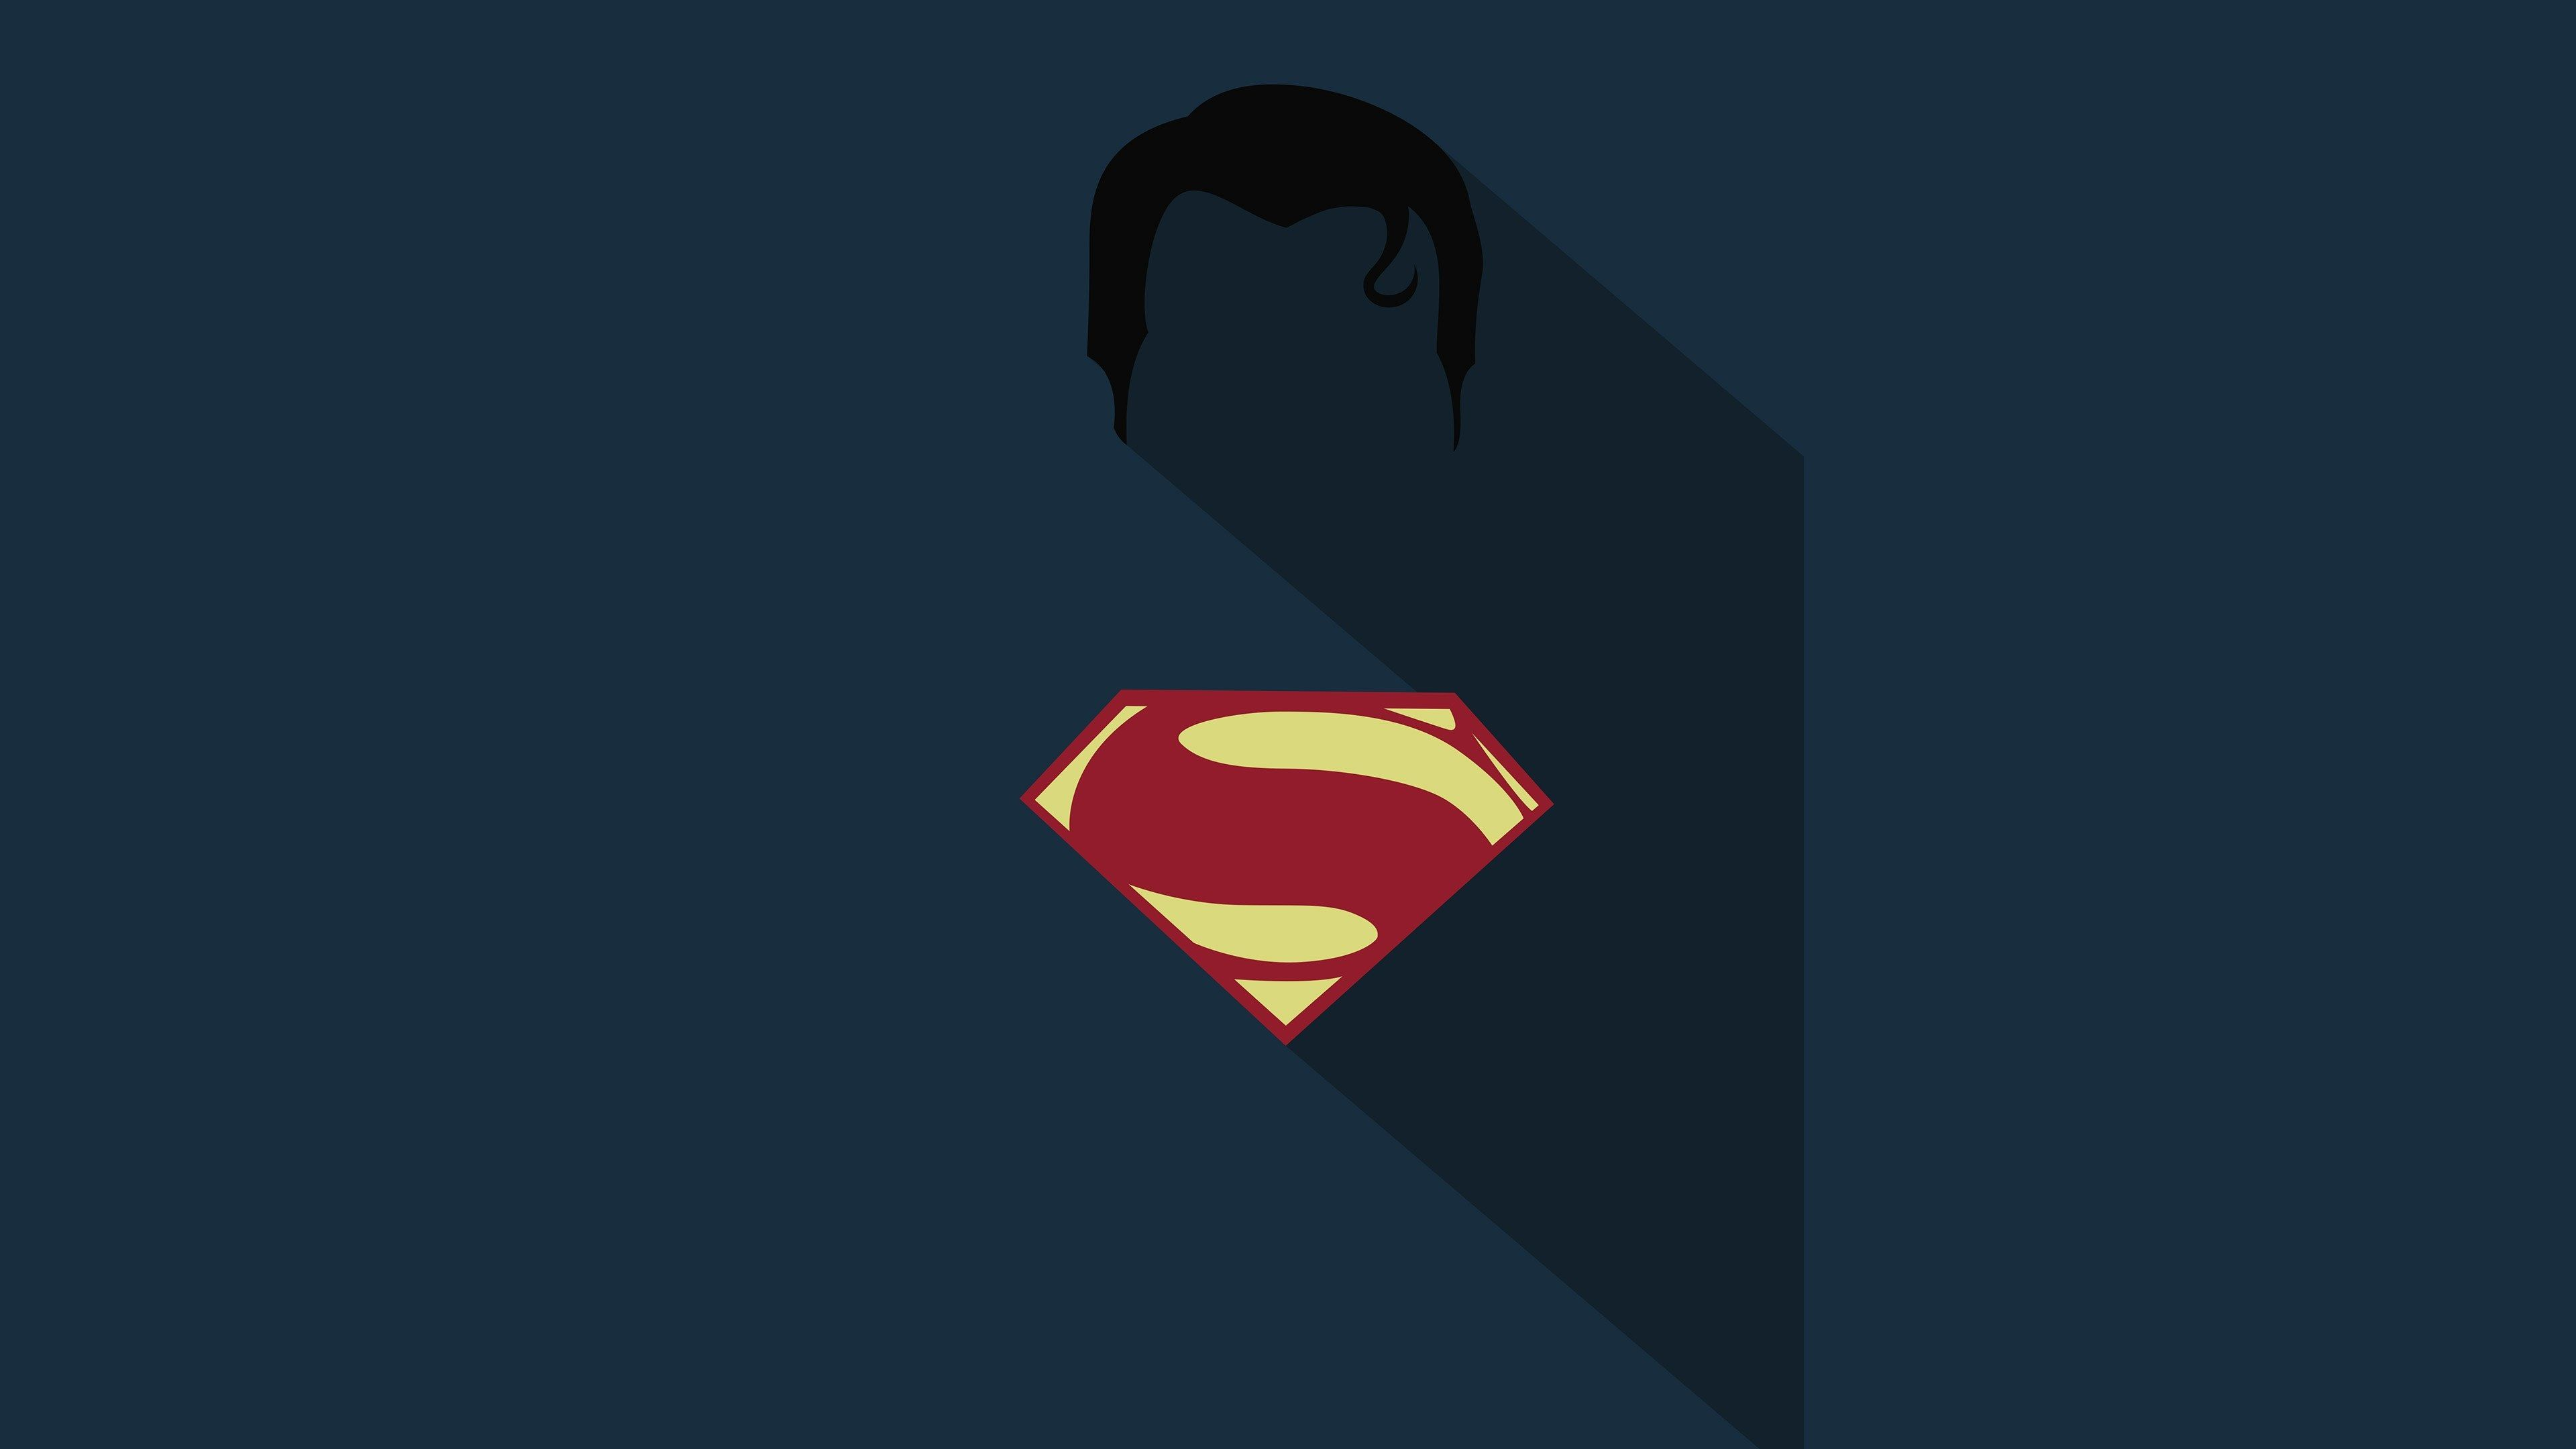 Minimalist Superman Wallpapers.